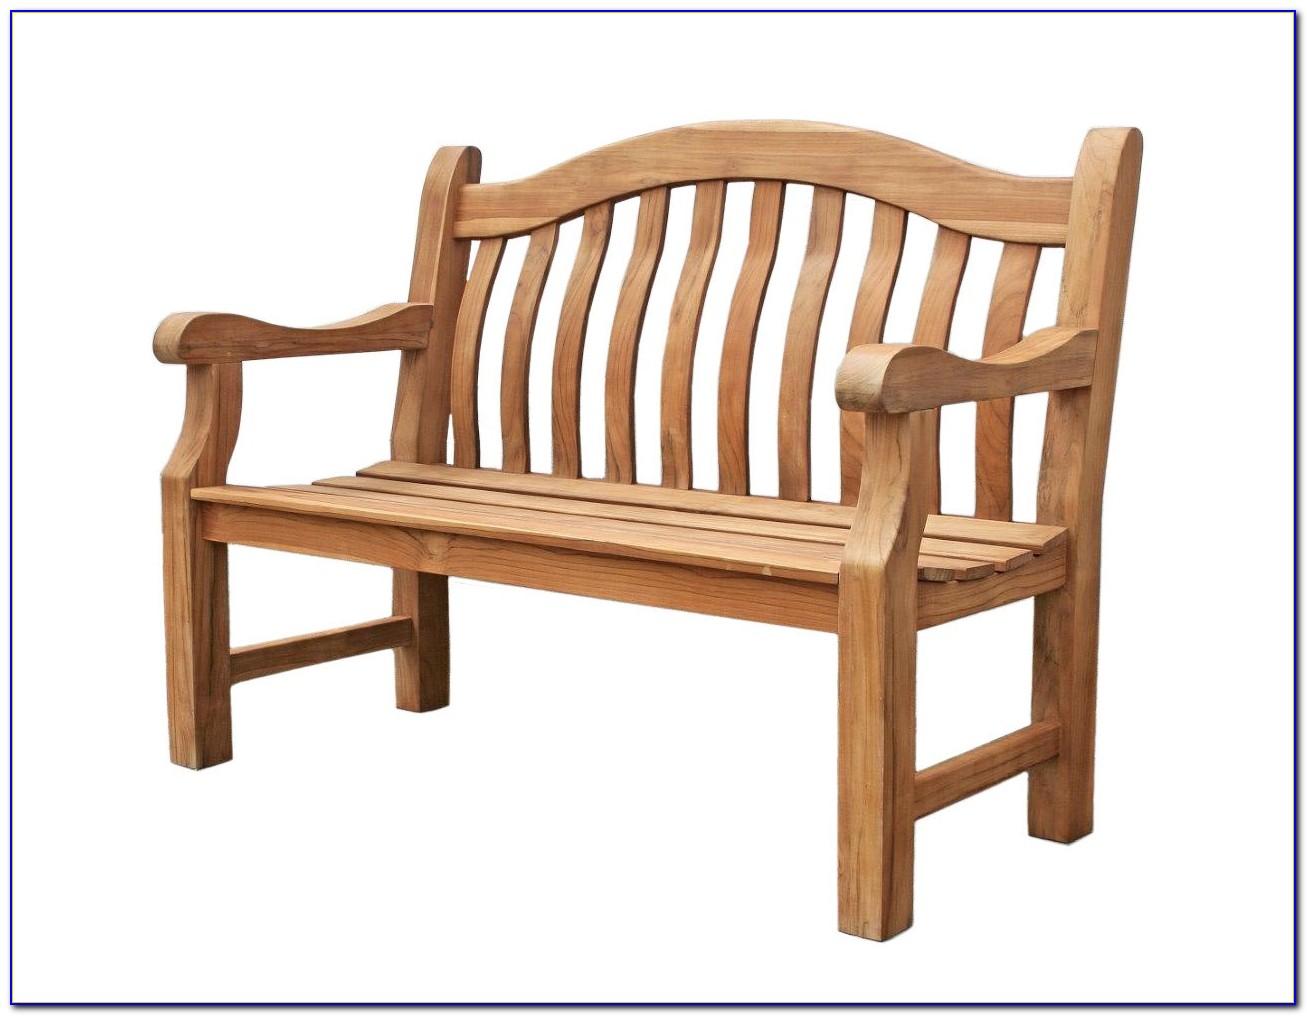 2 Seater Garden Bench Cushions